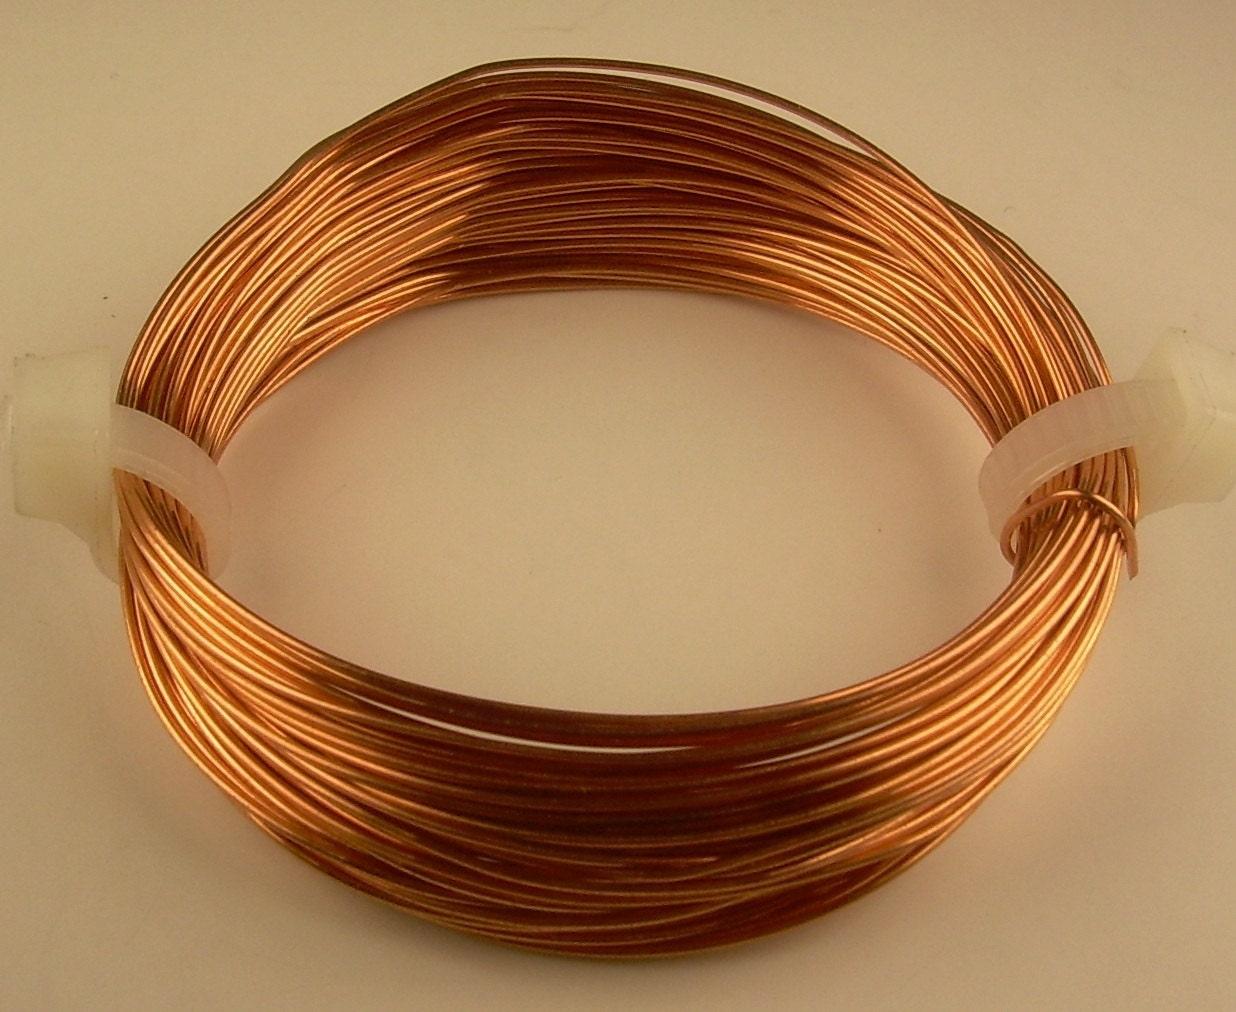 Copper Craft Wire 14ga 2oz 11ft Soft Solid Genuine Etsy Wiring Zoom